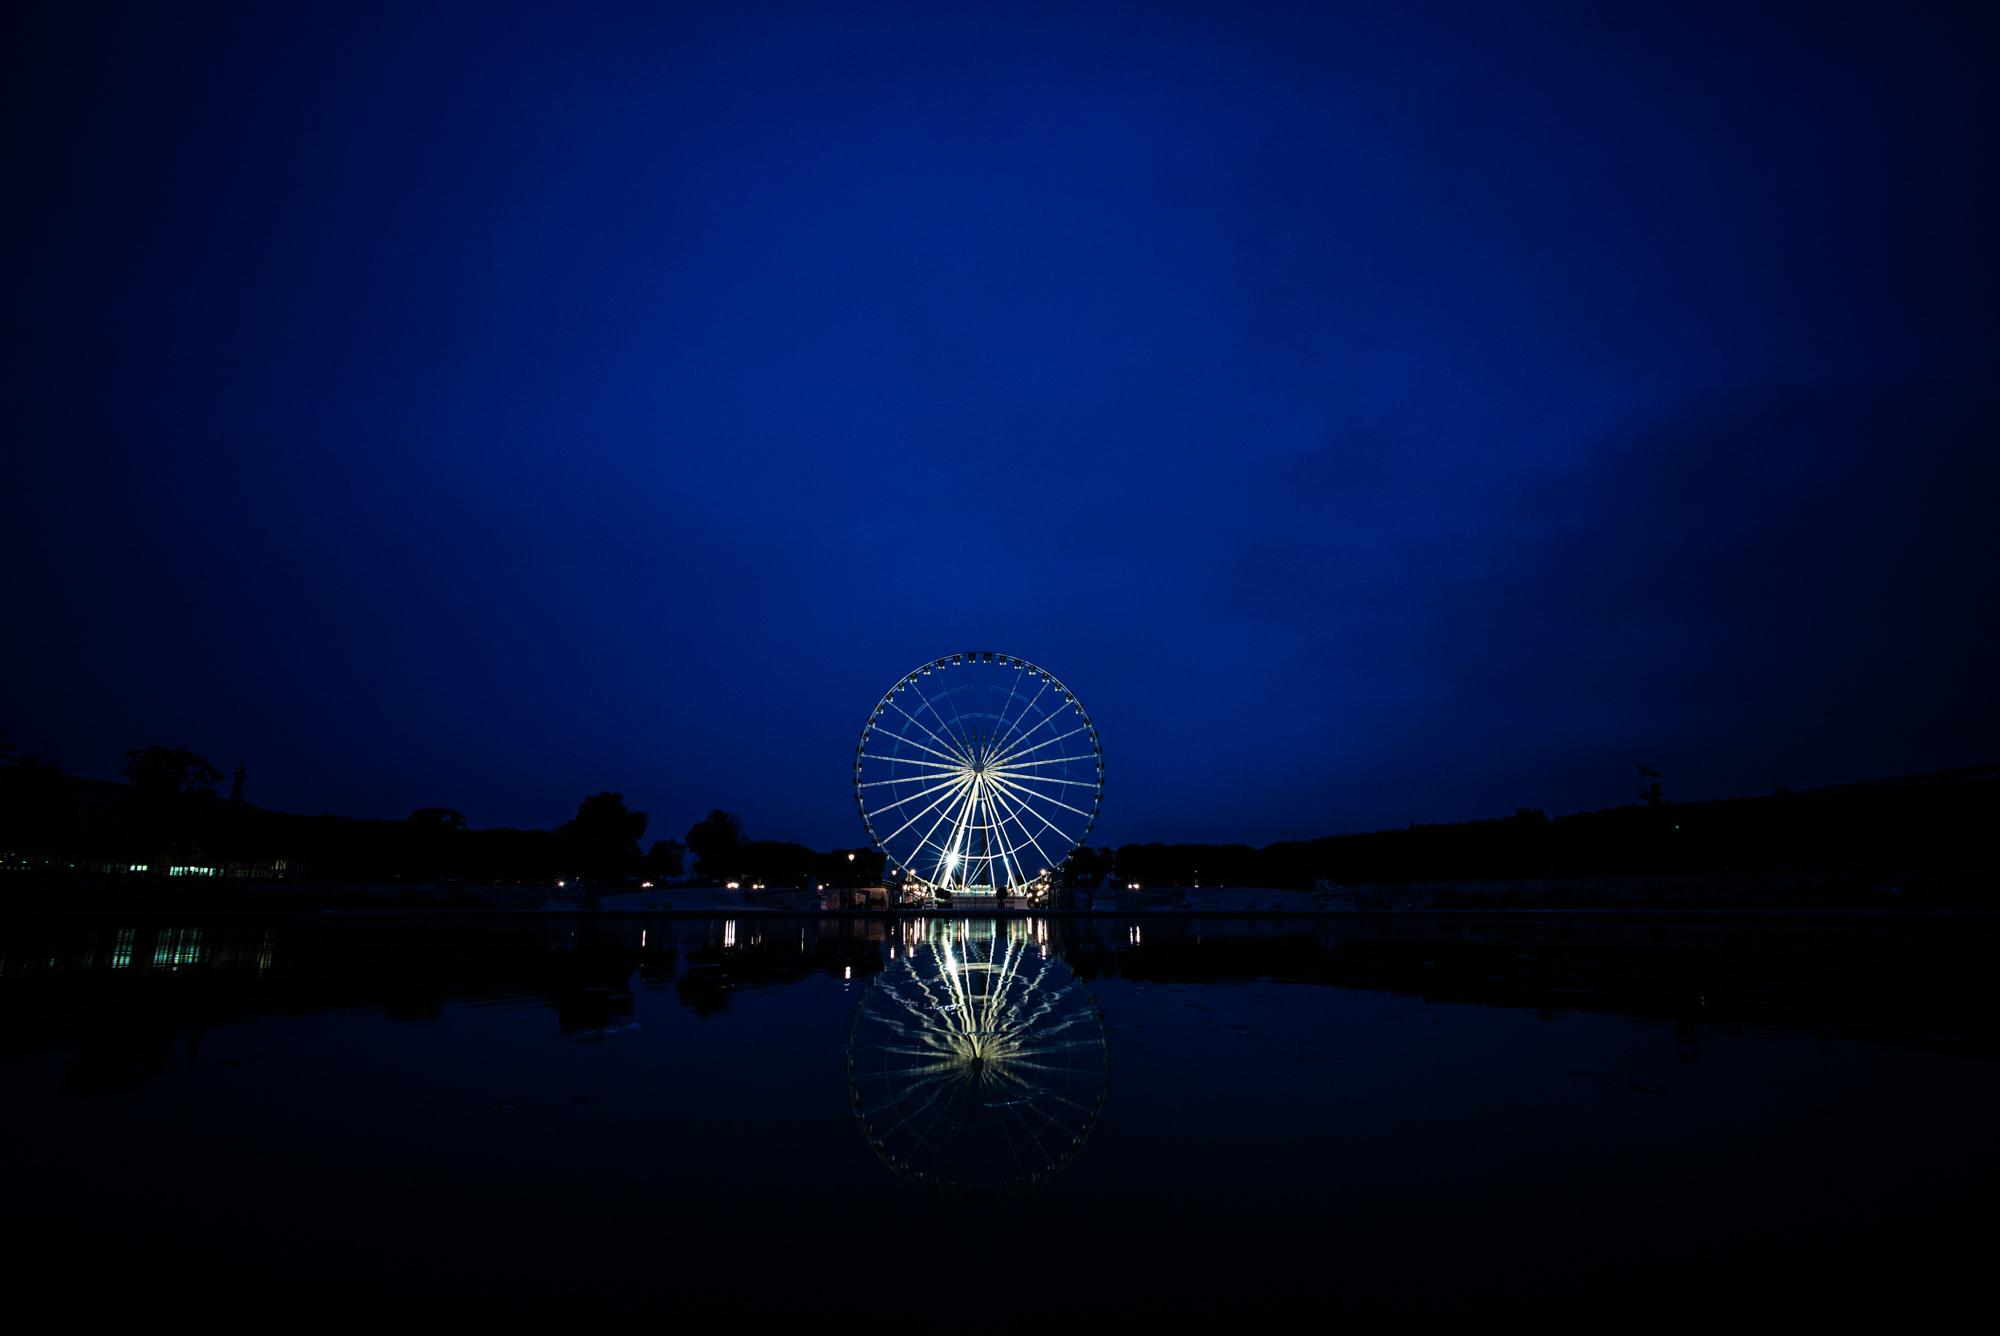 ferris wheel near Place de la Concorde, just before dawn